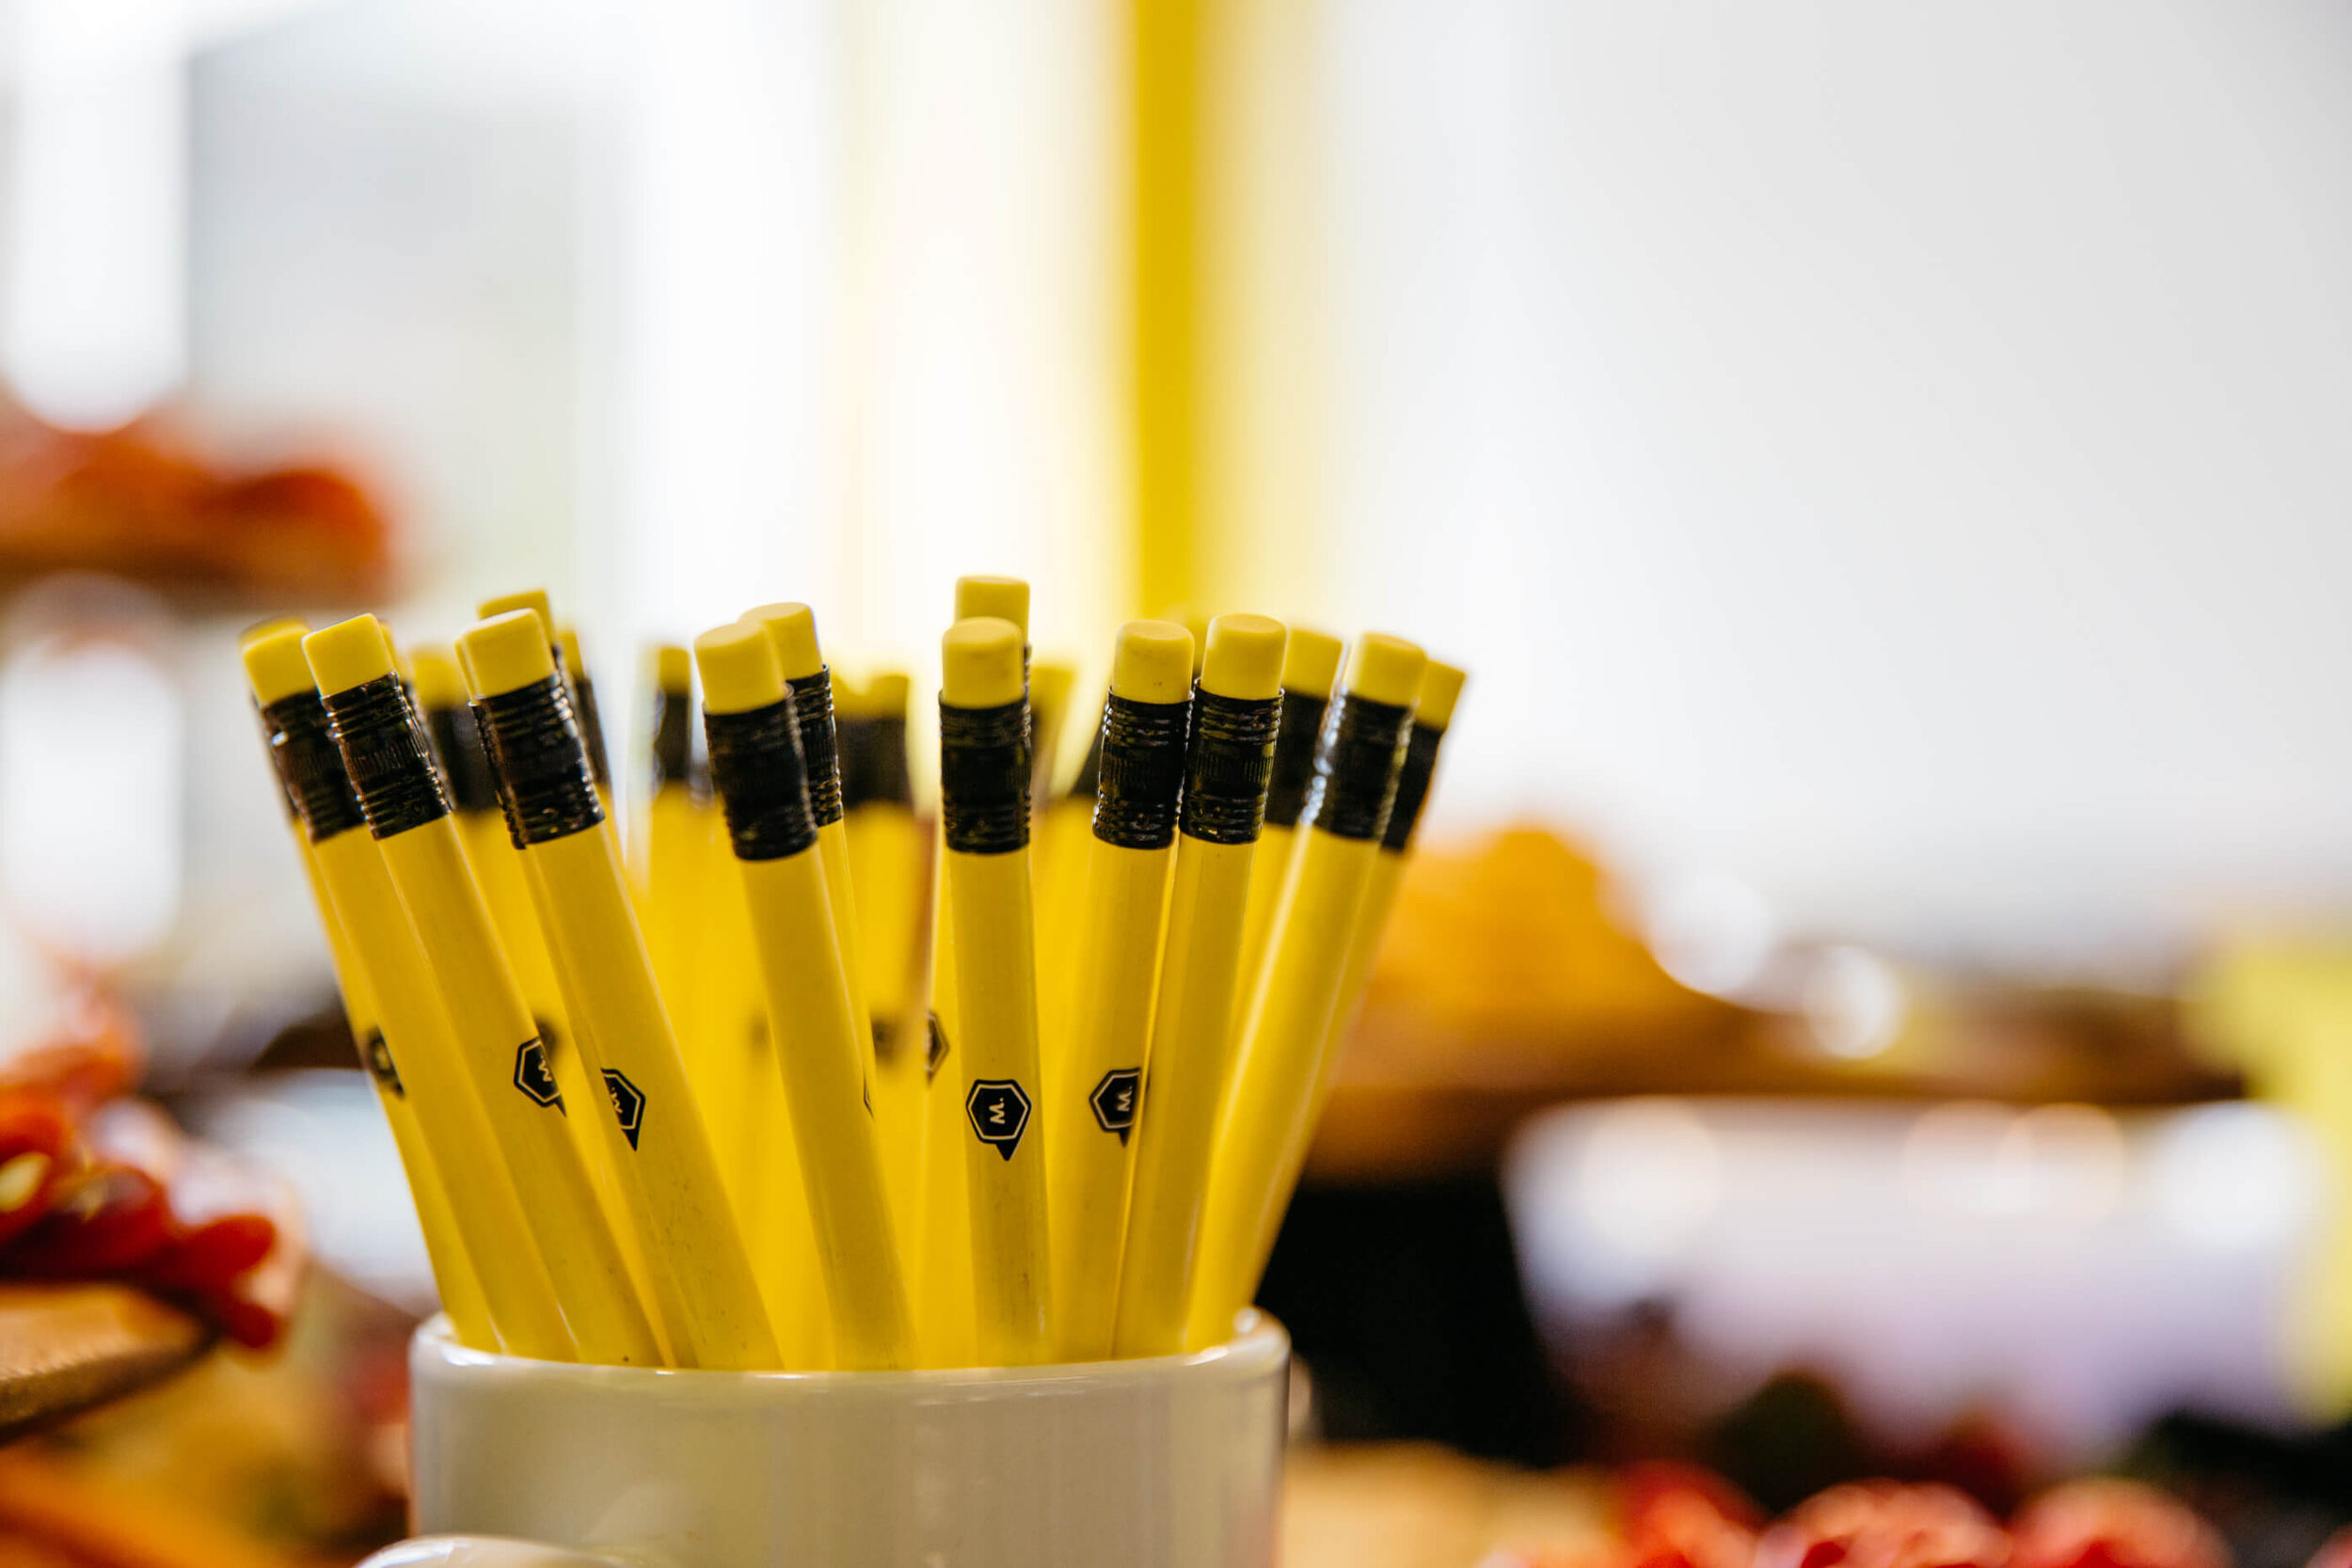 maycreate-pencils.jpg